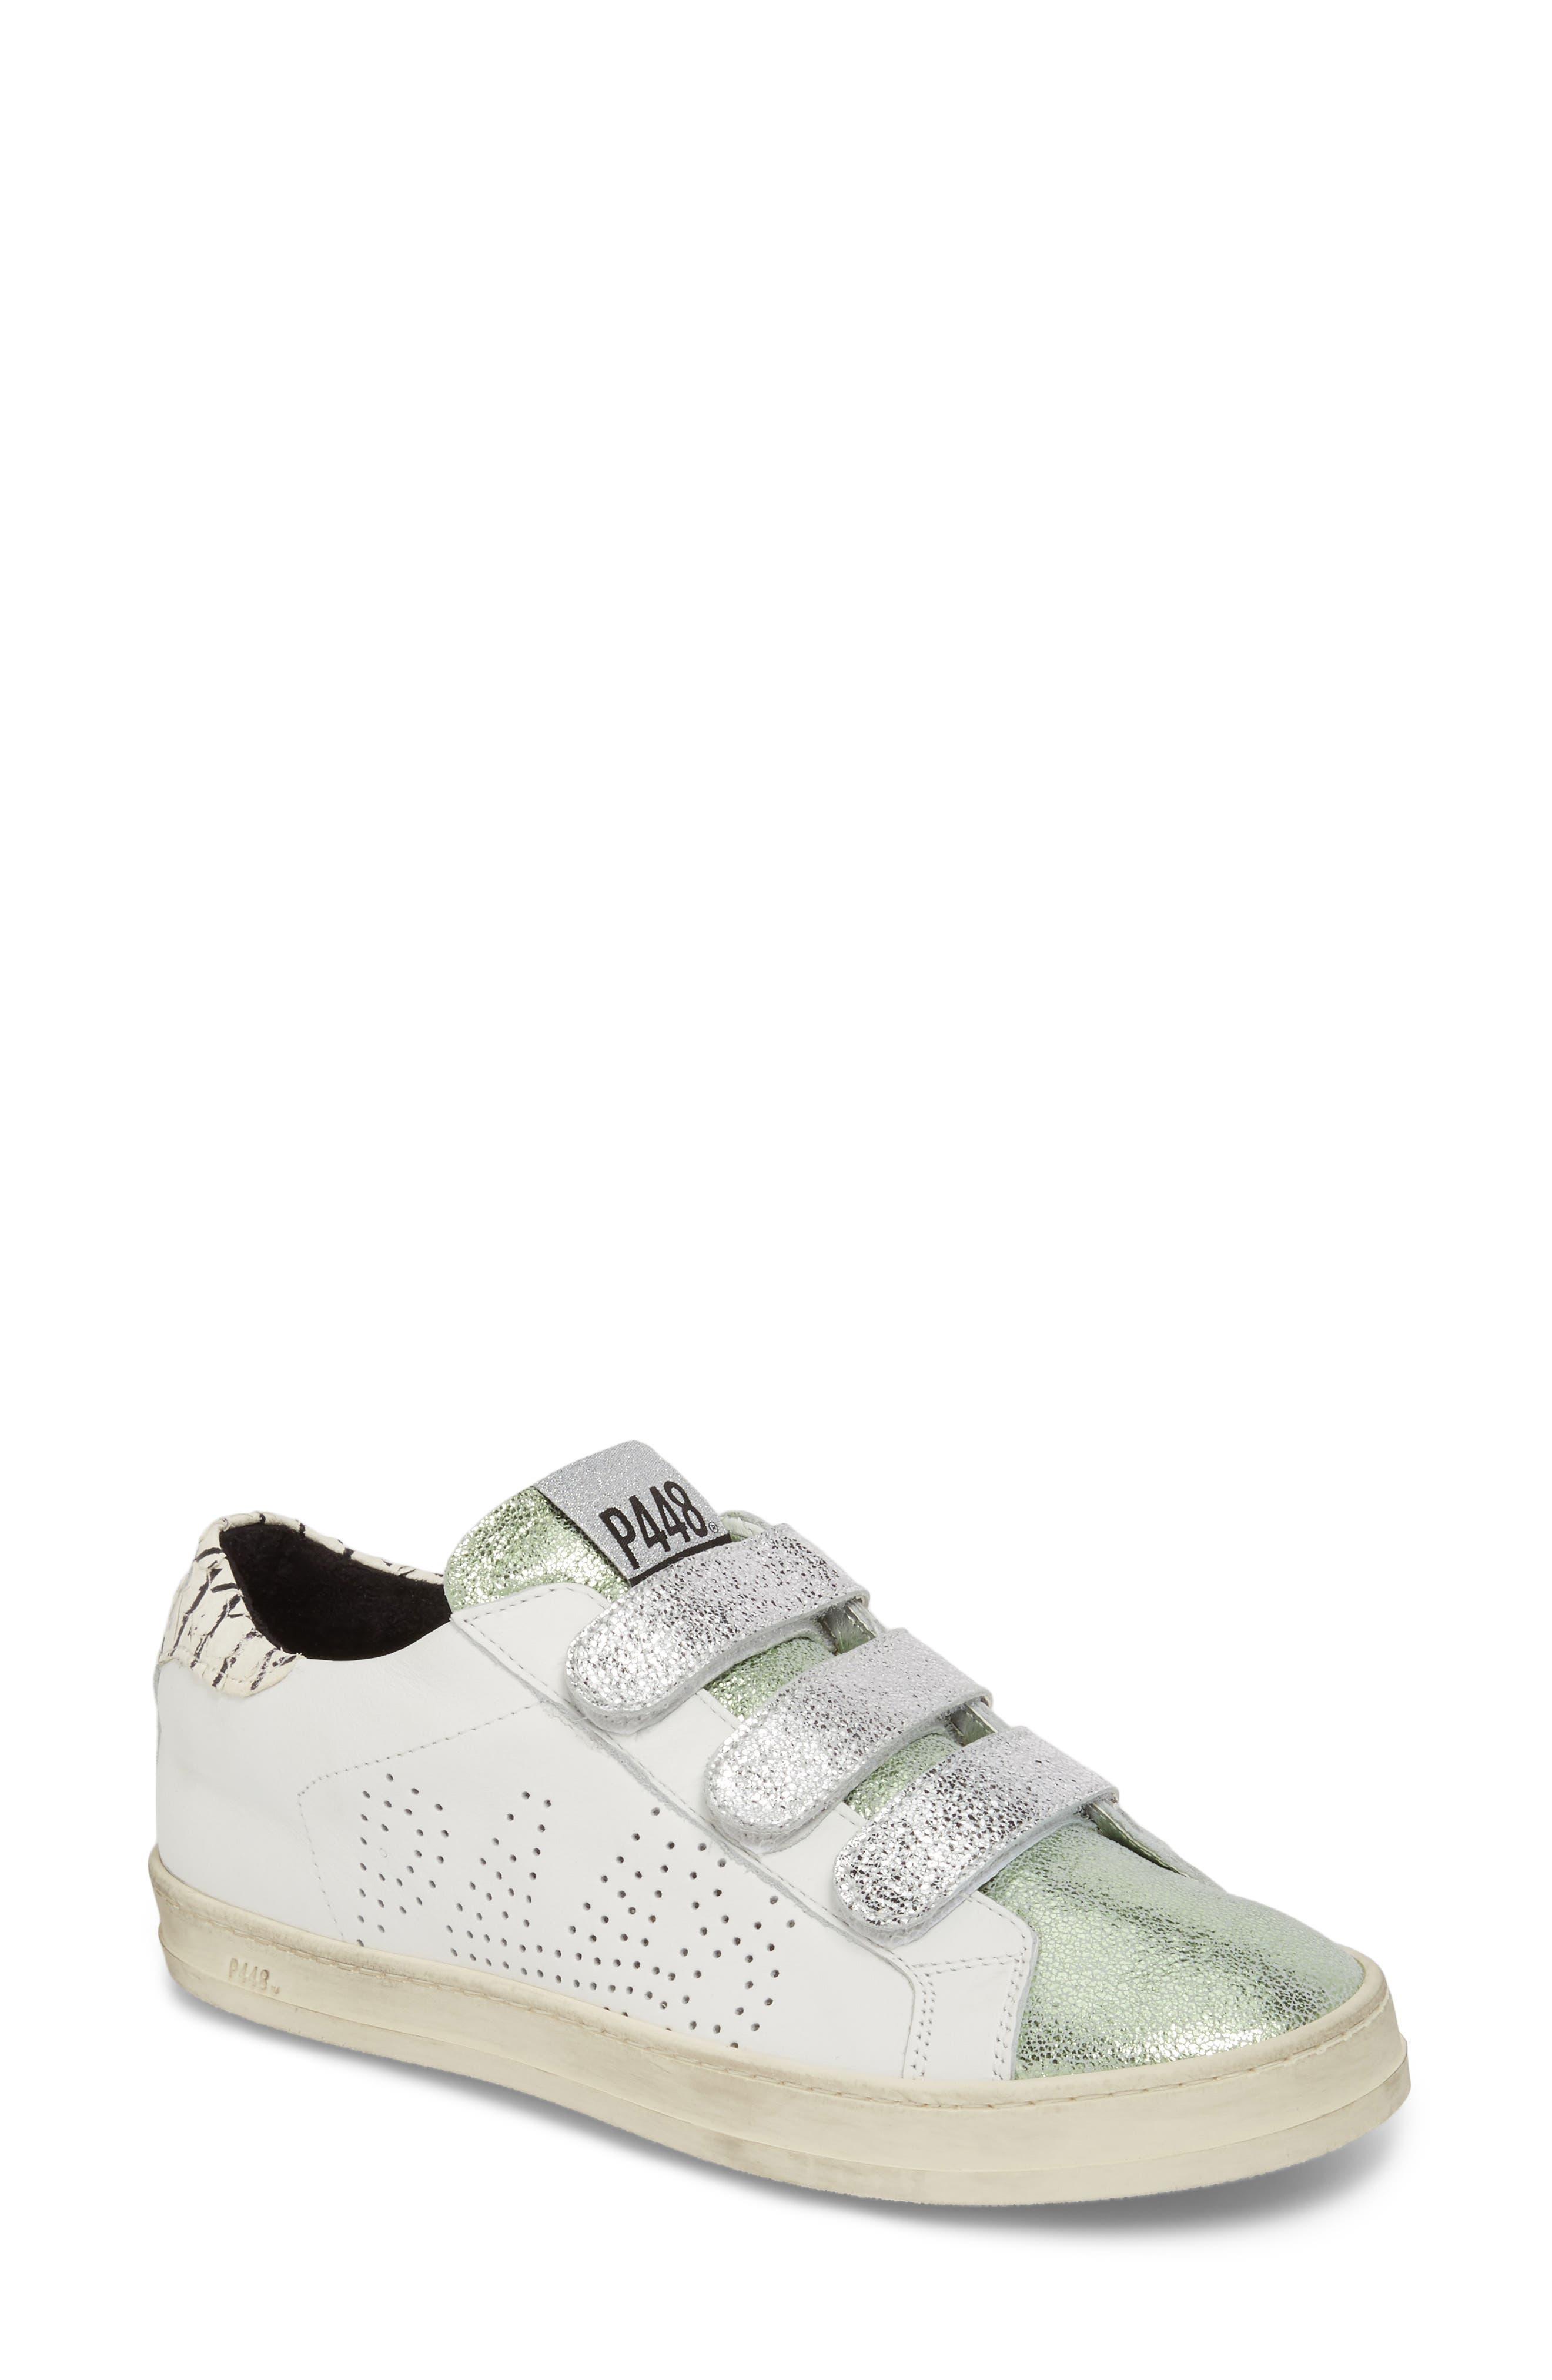 Ralph Sneaker,                             Main thumbnail 1, color,                             300